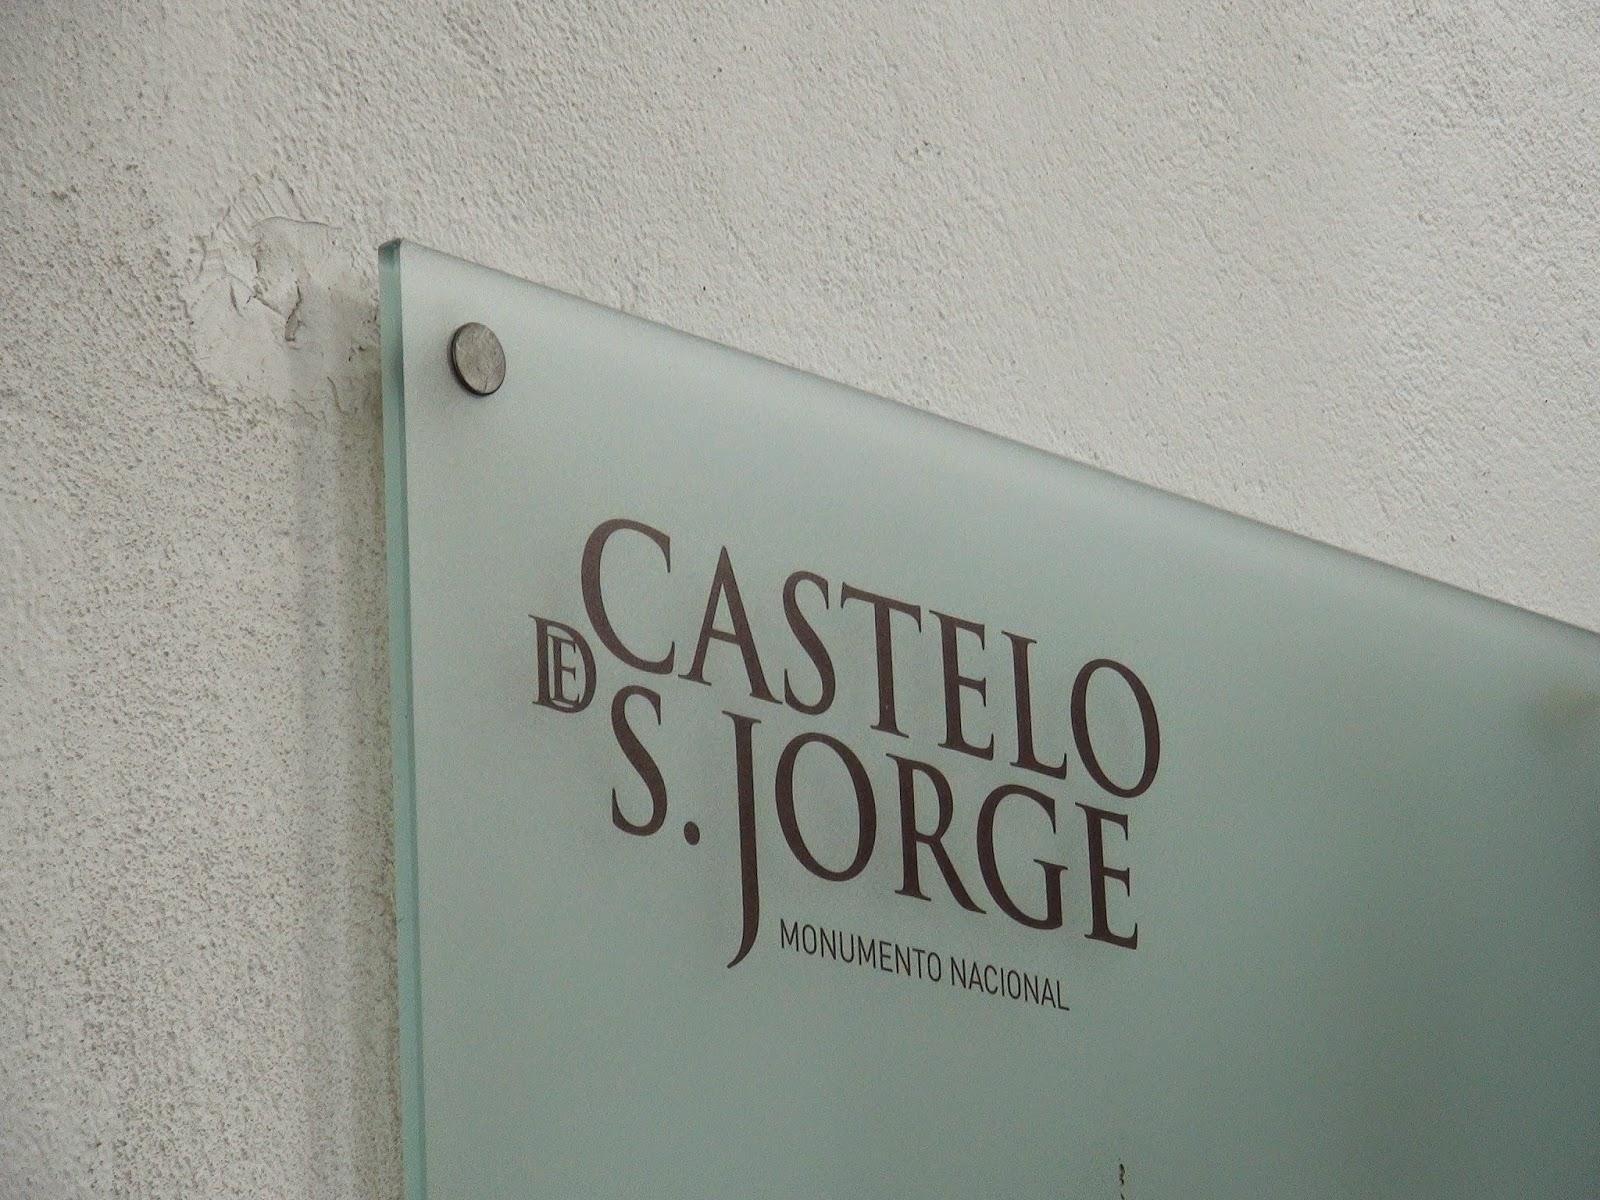 Castello S. Jorge - Lisboa - Lisbonne - Lisbon